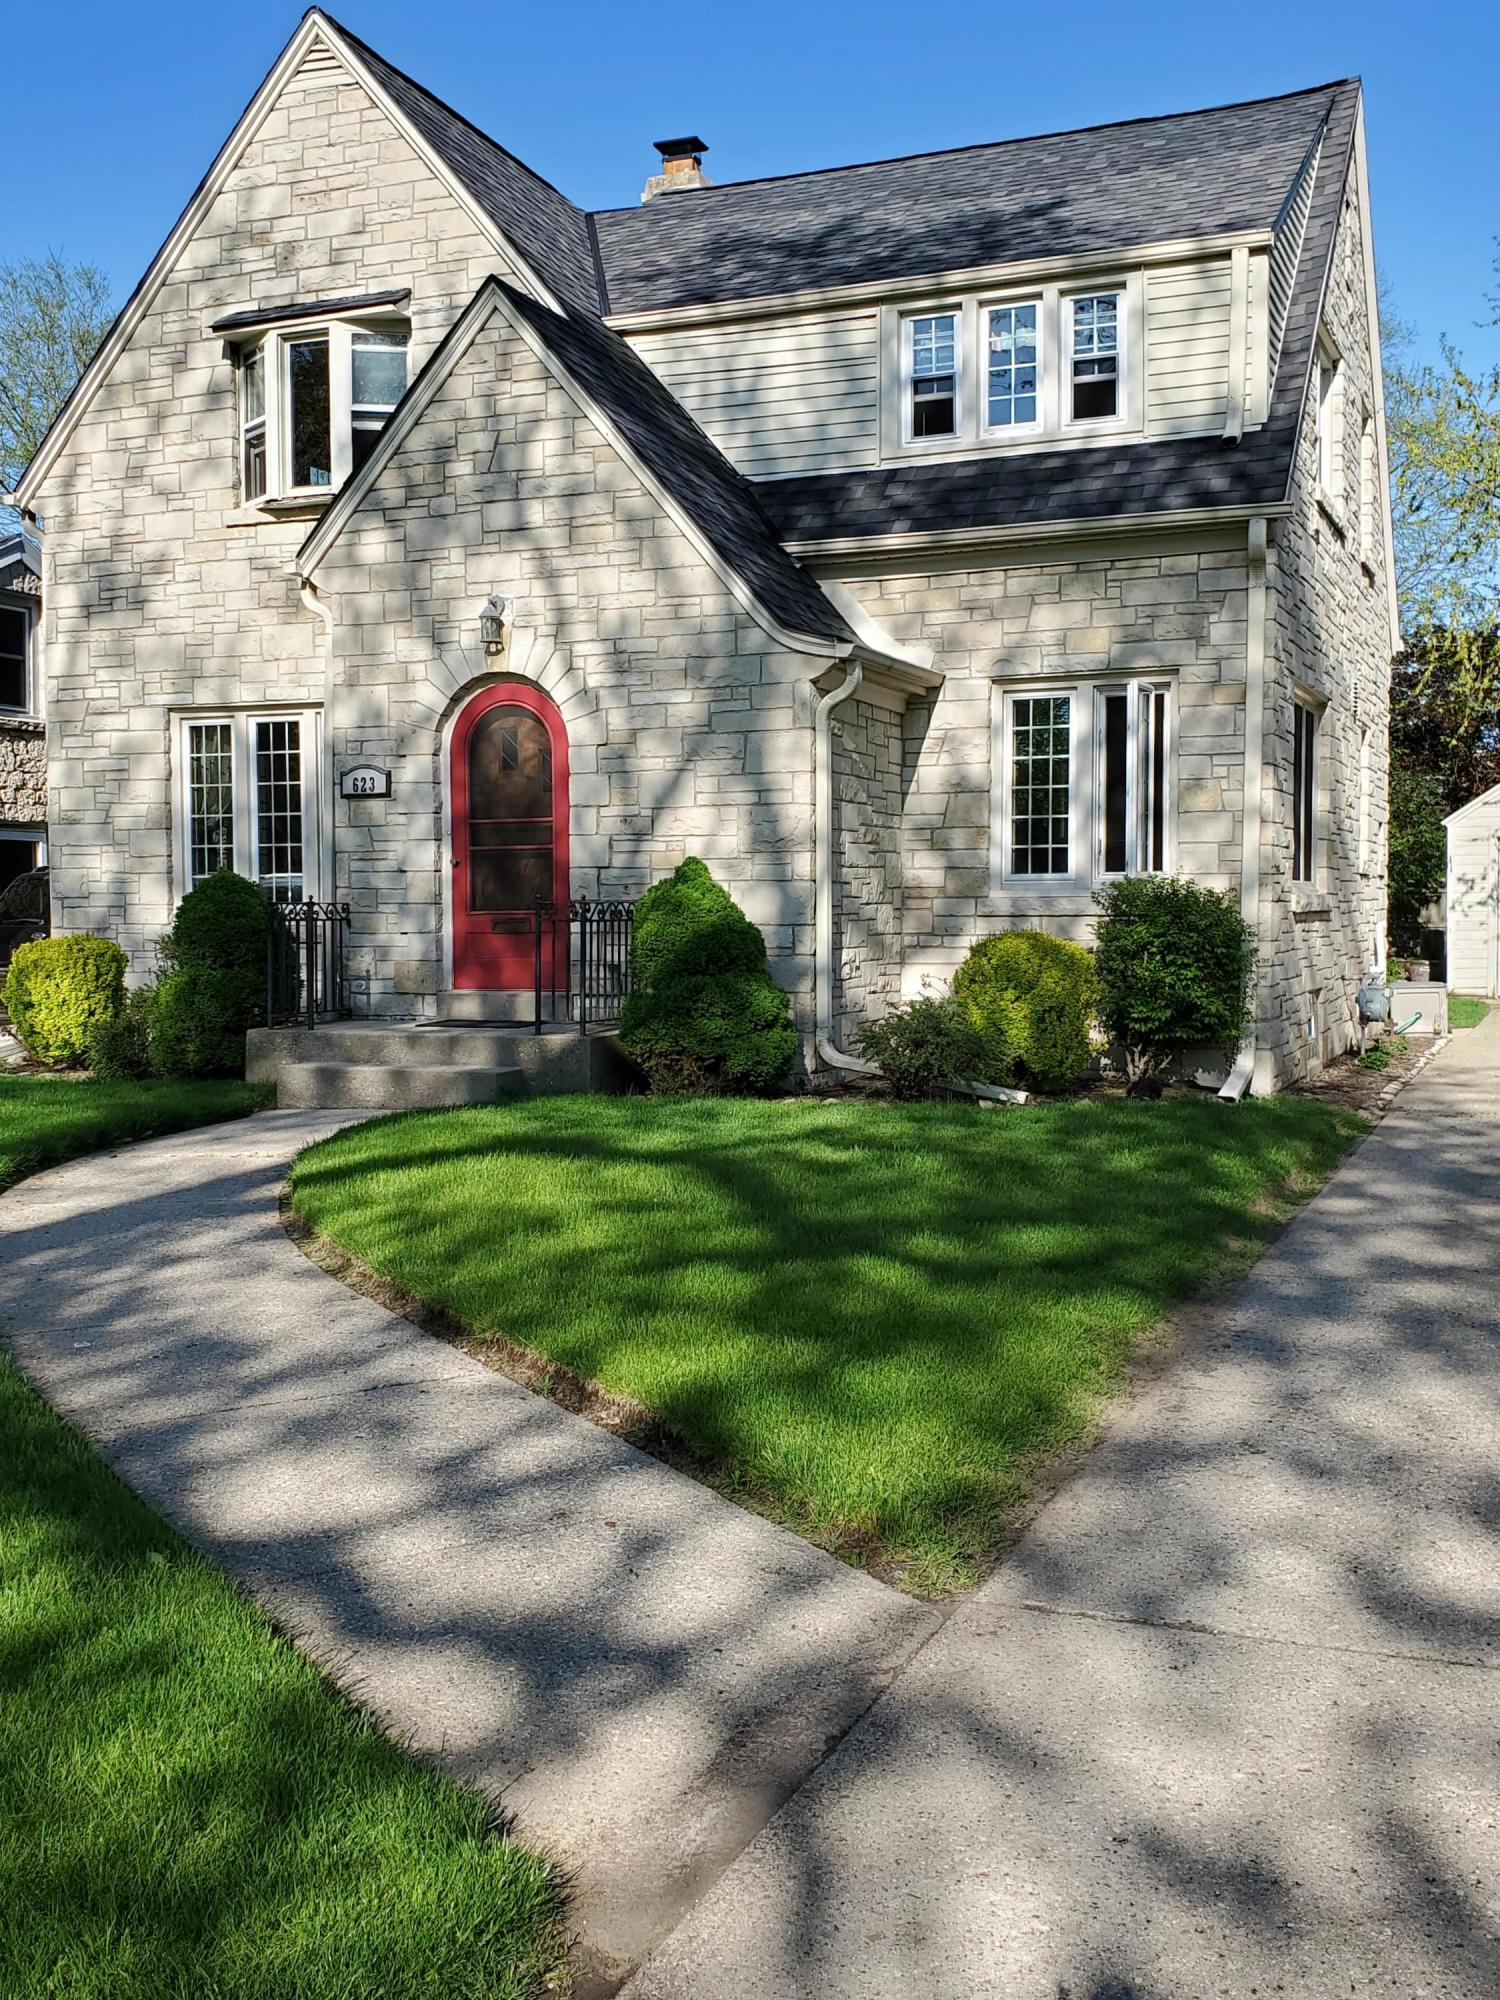 623 Cumberland Dr, Waukesha, Wisconsin 53188, 3 Bedrooms Bedrooms, 6 Rooms Rooms,1 BathroomBathrooms,Single-Family,For Sale,Cumberland Dr,1689896